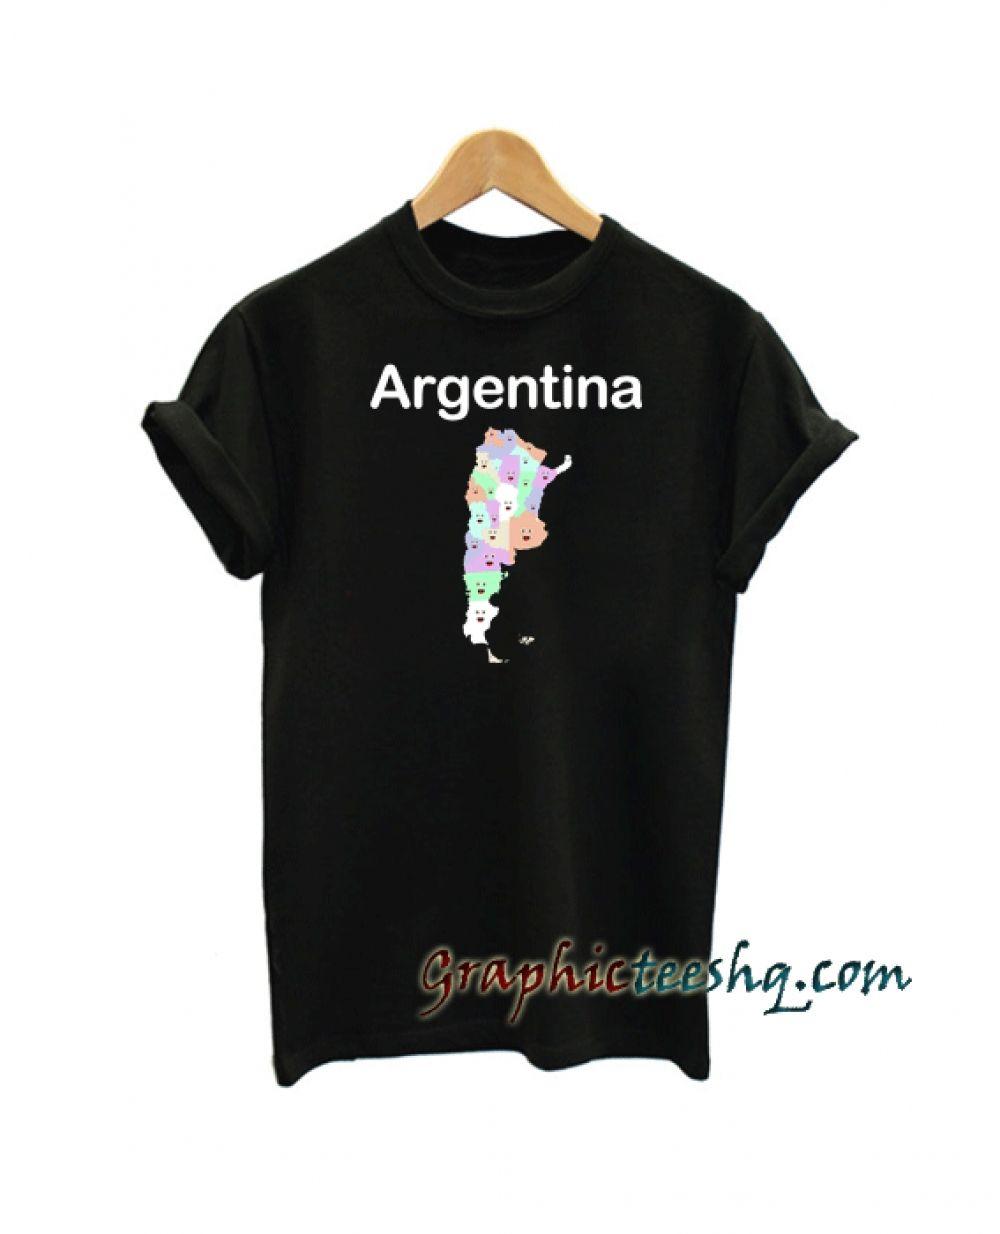 95a5d374 Argentina Geography Tee Shirt Price: 13.50 #style #fashion #tshirts #tee  #tshirtdesign#instafashion #black #cute #art #amazing#funny #webstagram  #lol #hot ...